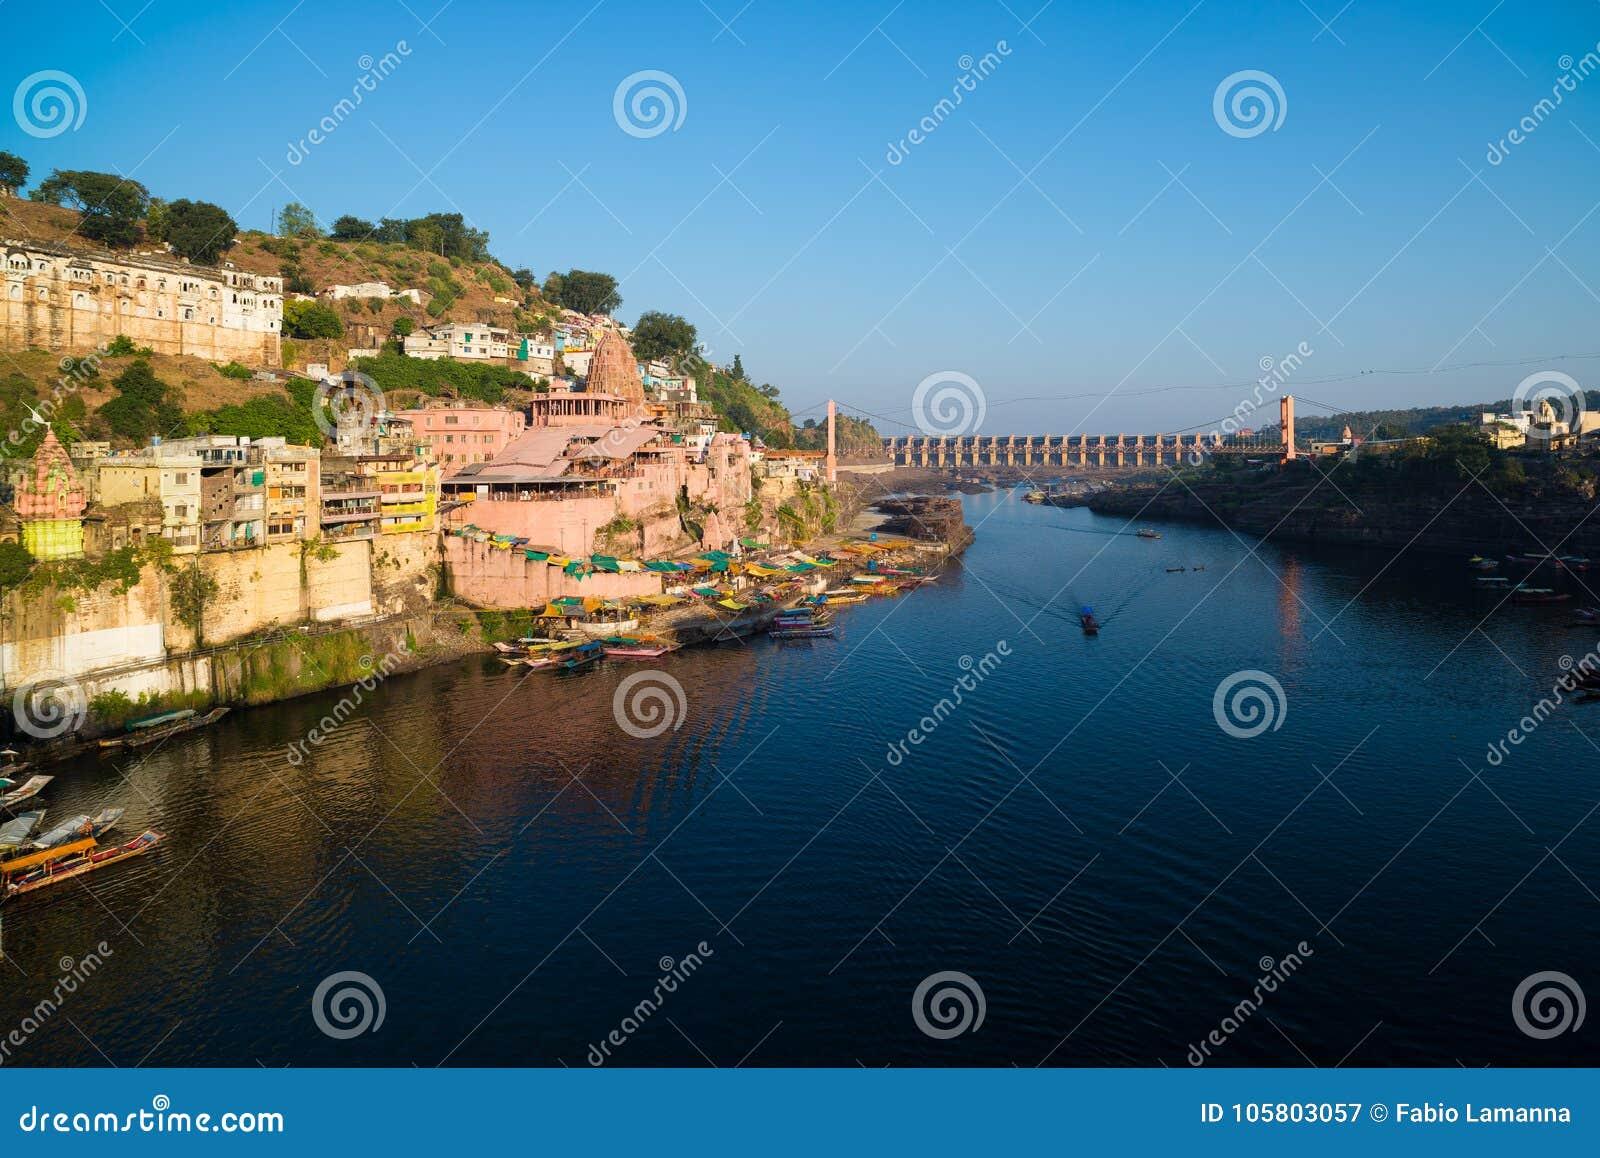 Omkareshwar cityscape, India, sacred hindu temple. Holy Narmada River, boats floating. Travel destination for tourists and pilgrim